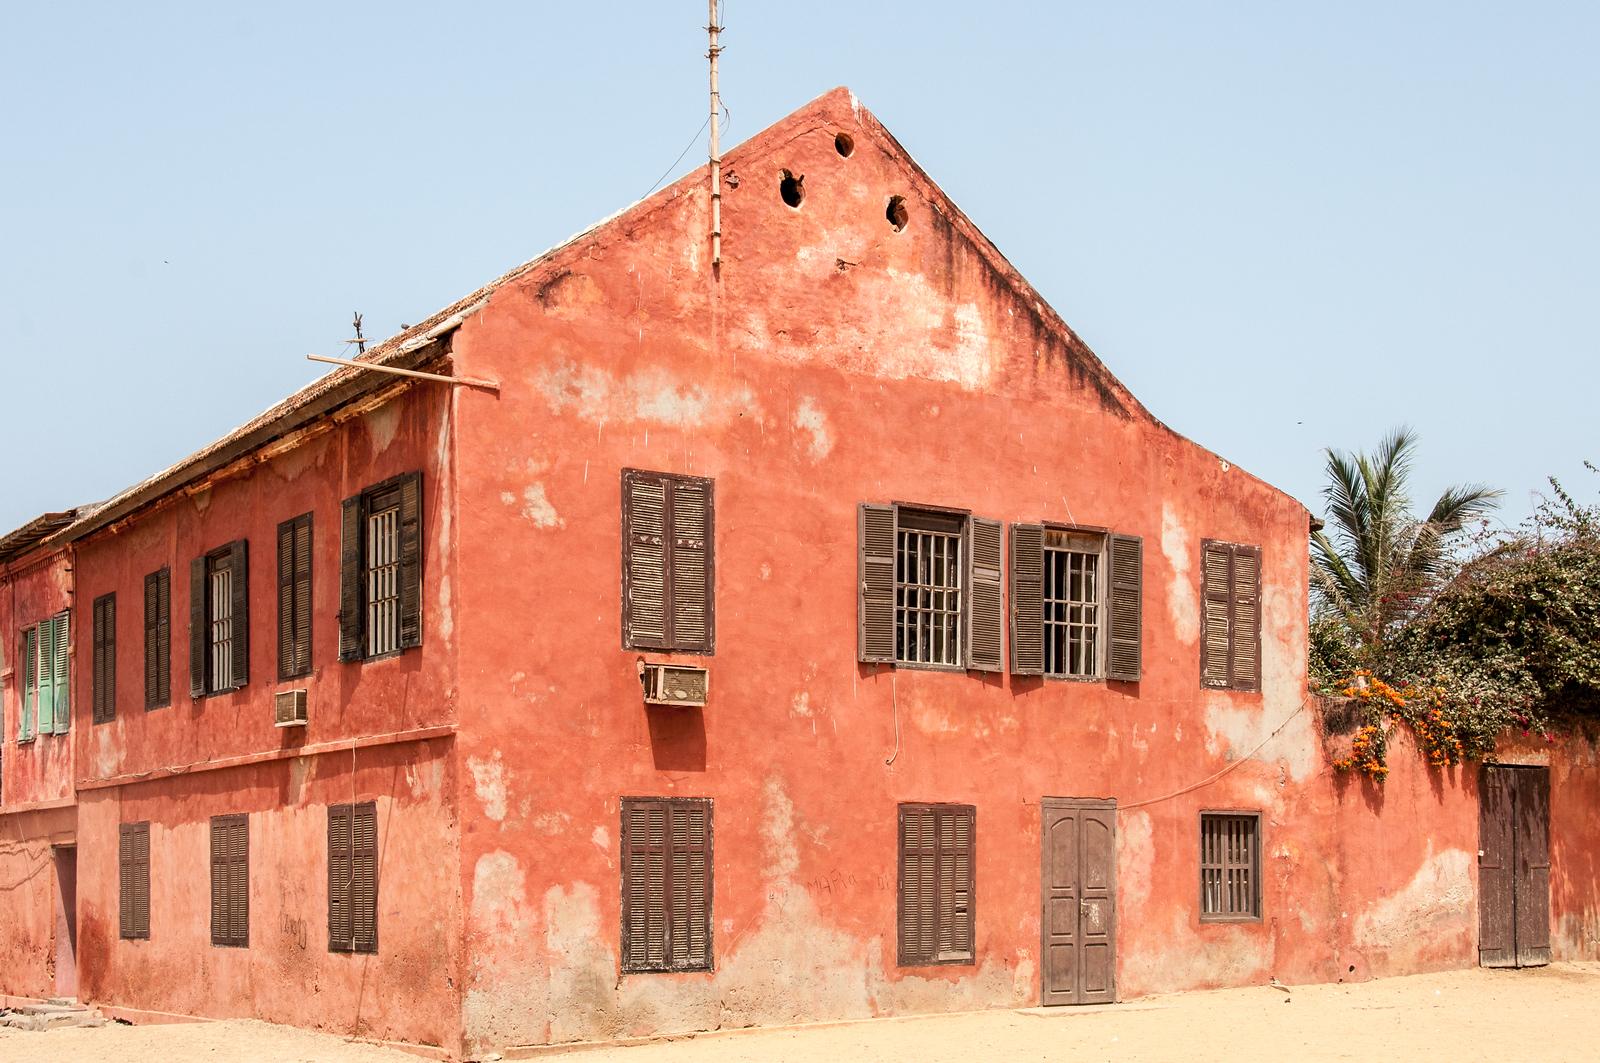 Old building in Dakar, Senegal